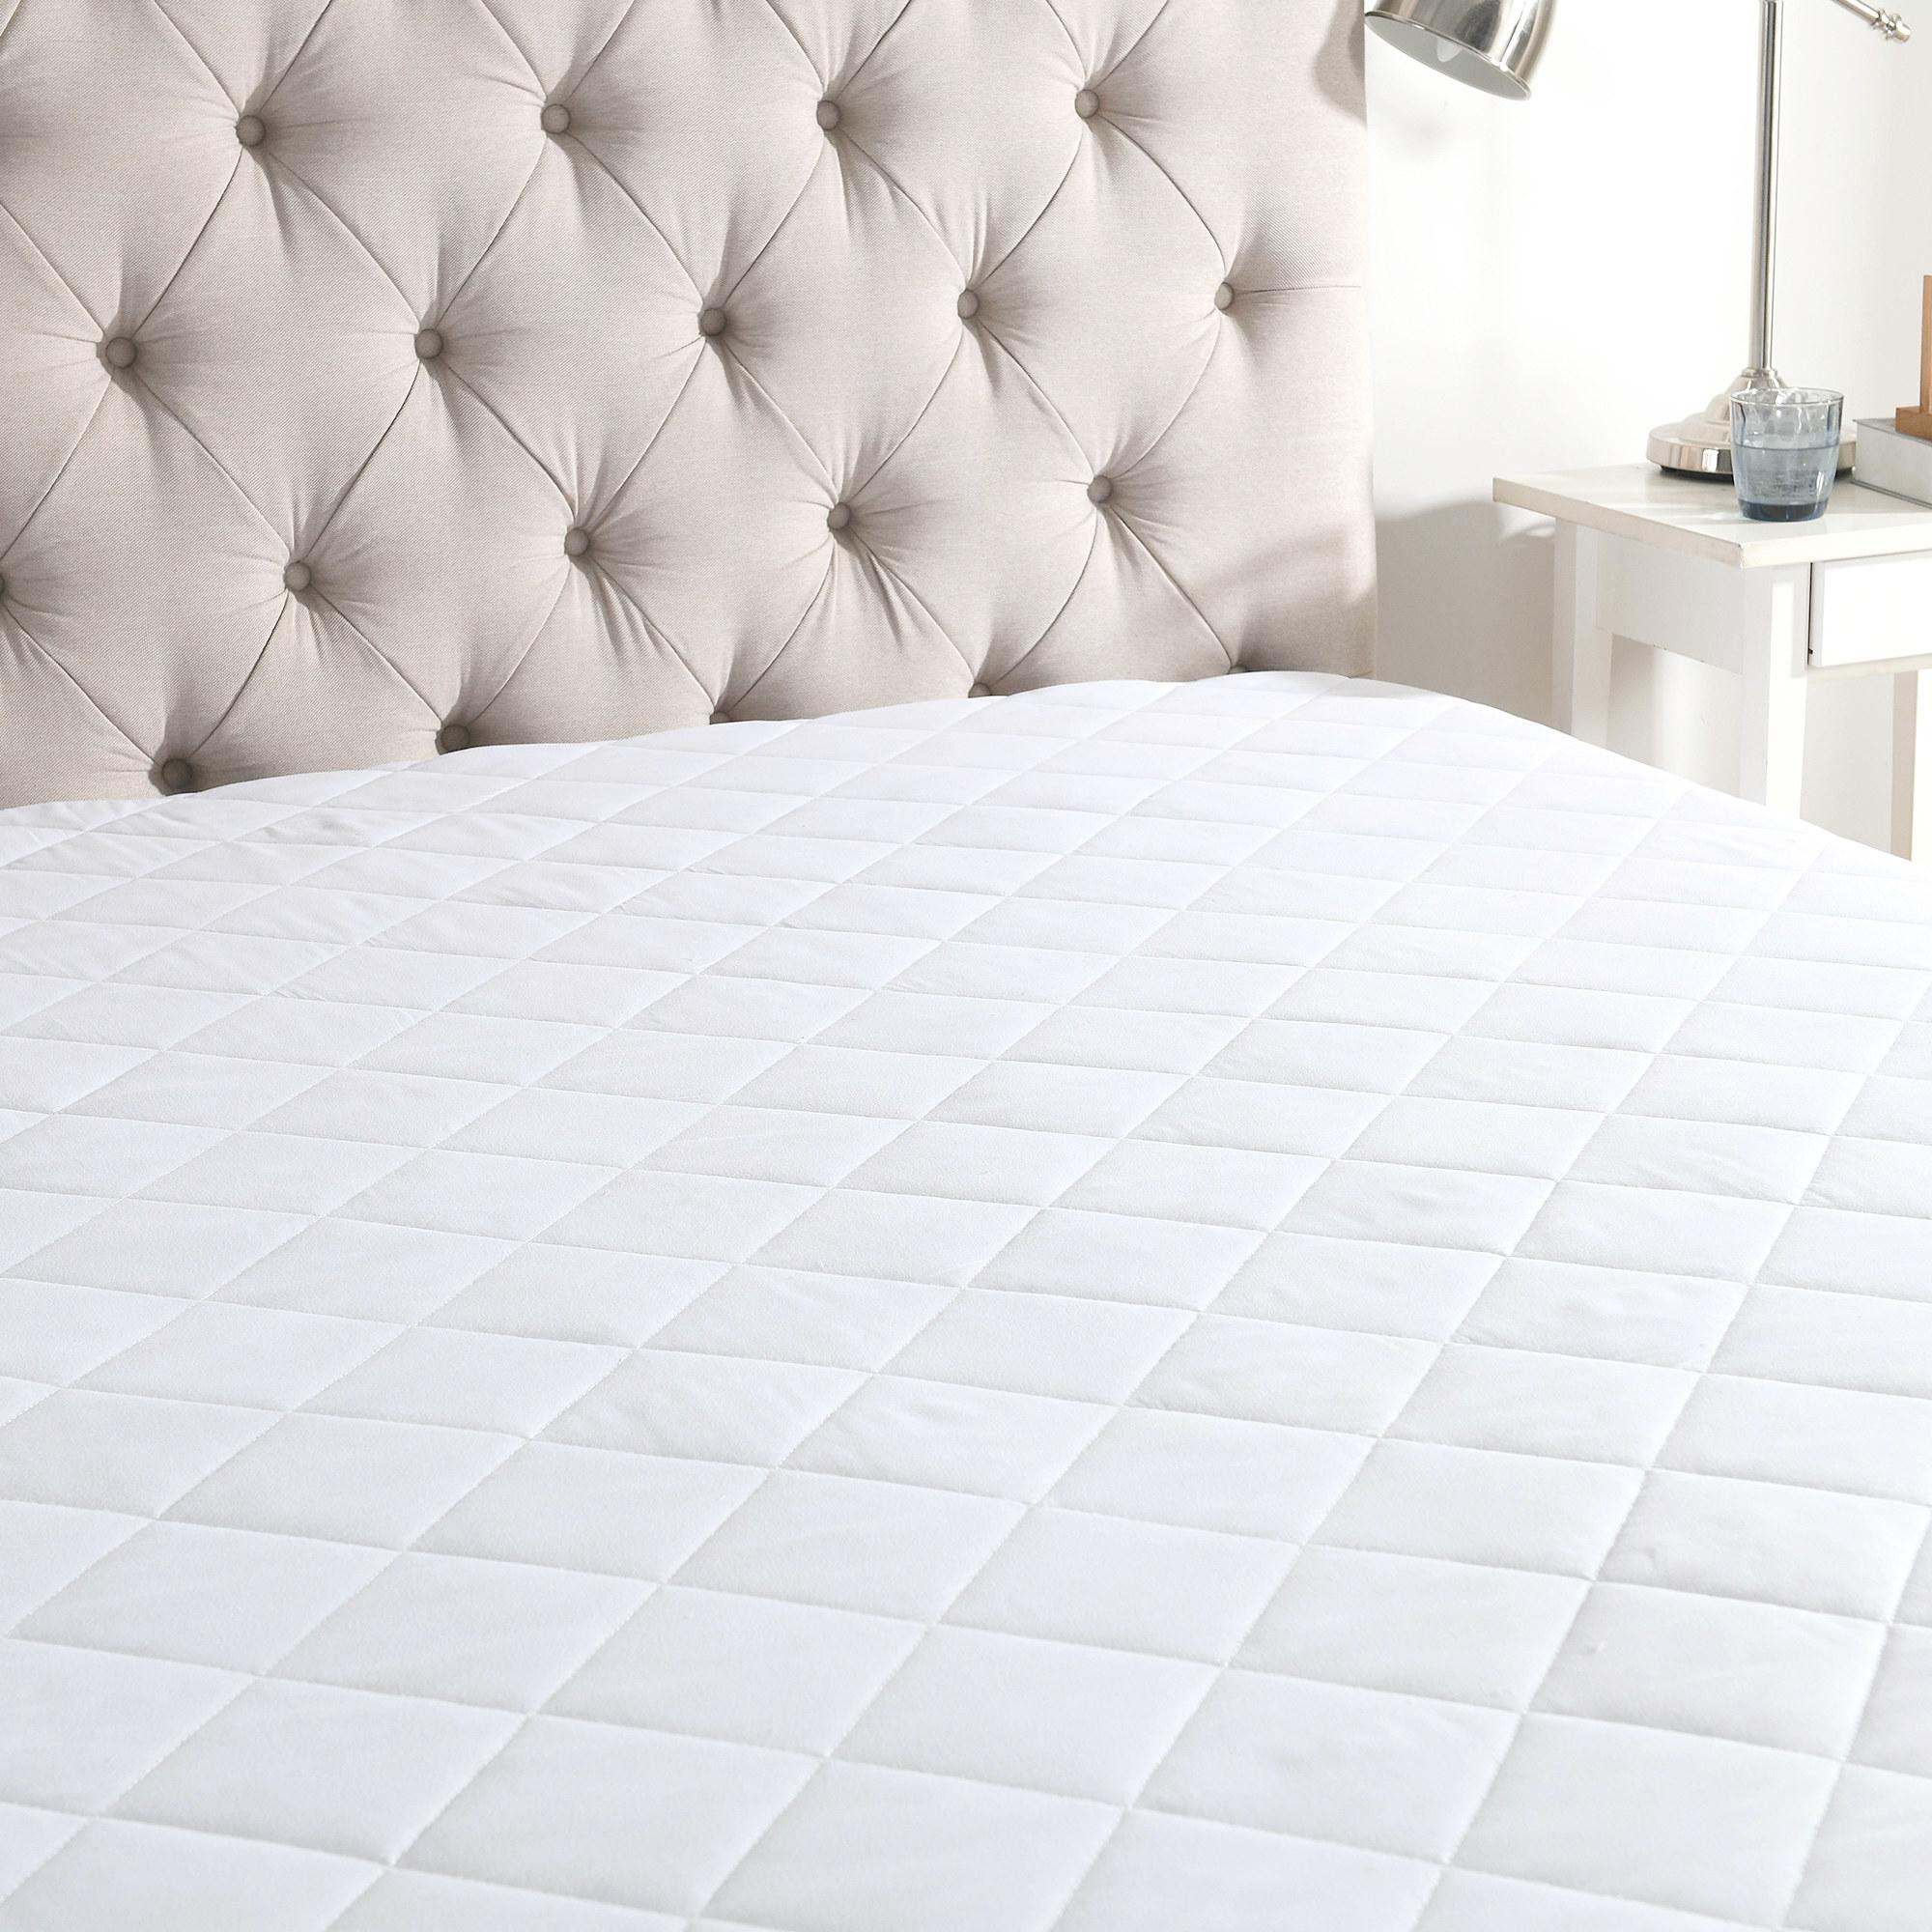 The mattress pad